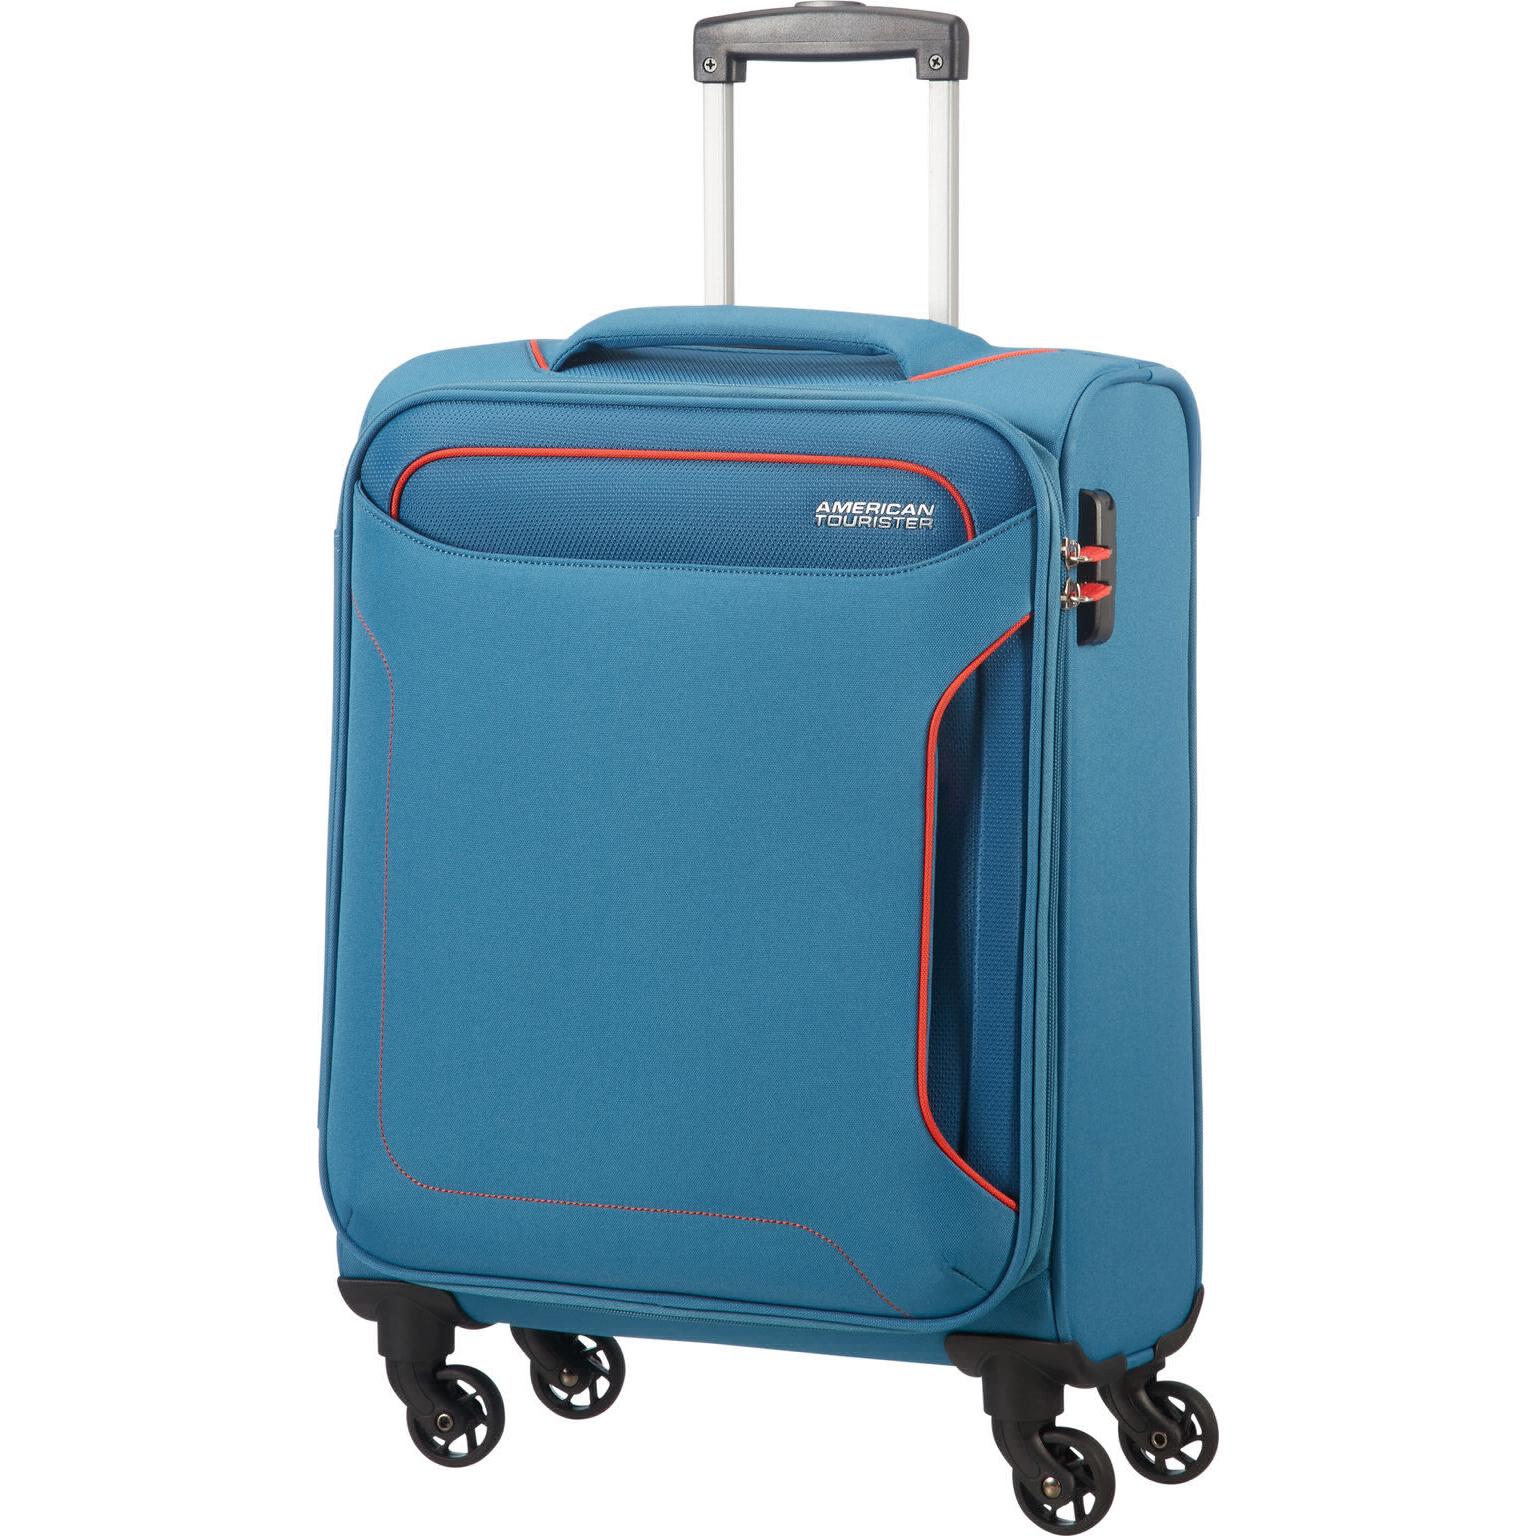 Чемодан American Tourister 4-х колесный голубой 40х20х55 см.